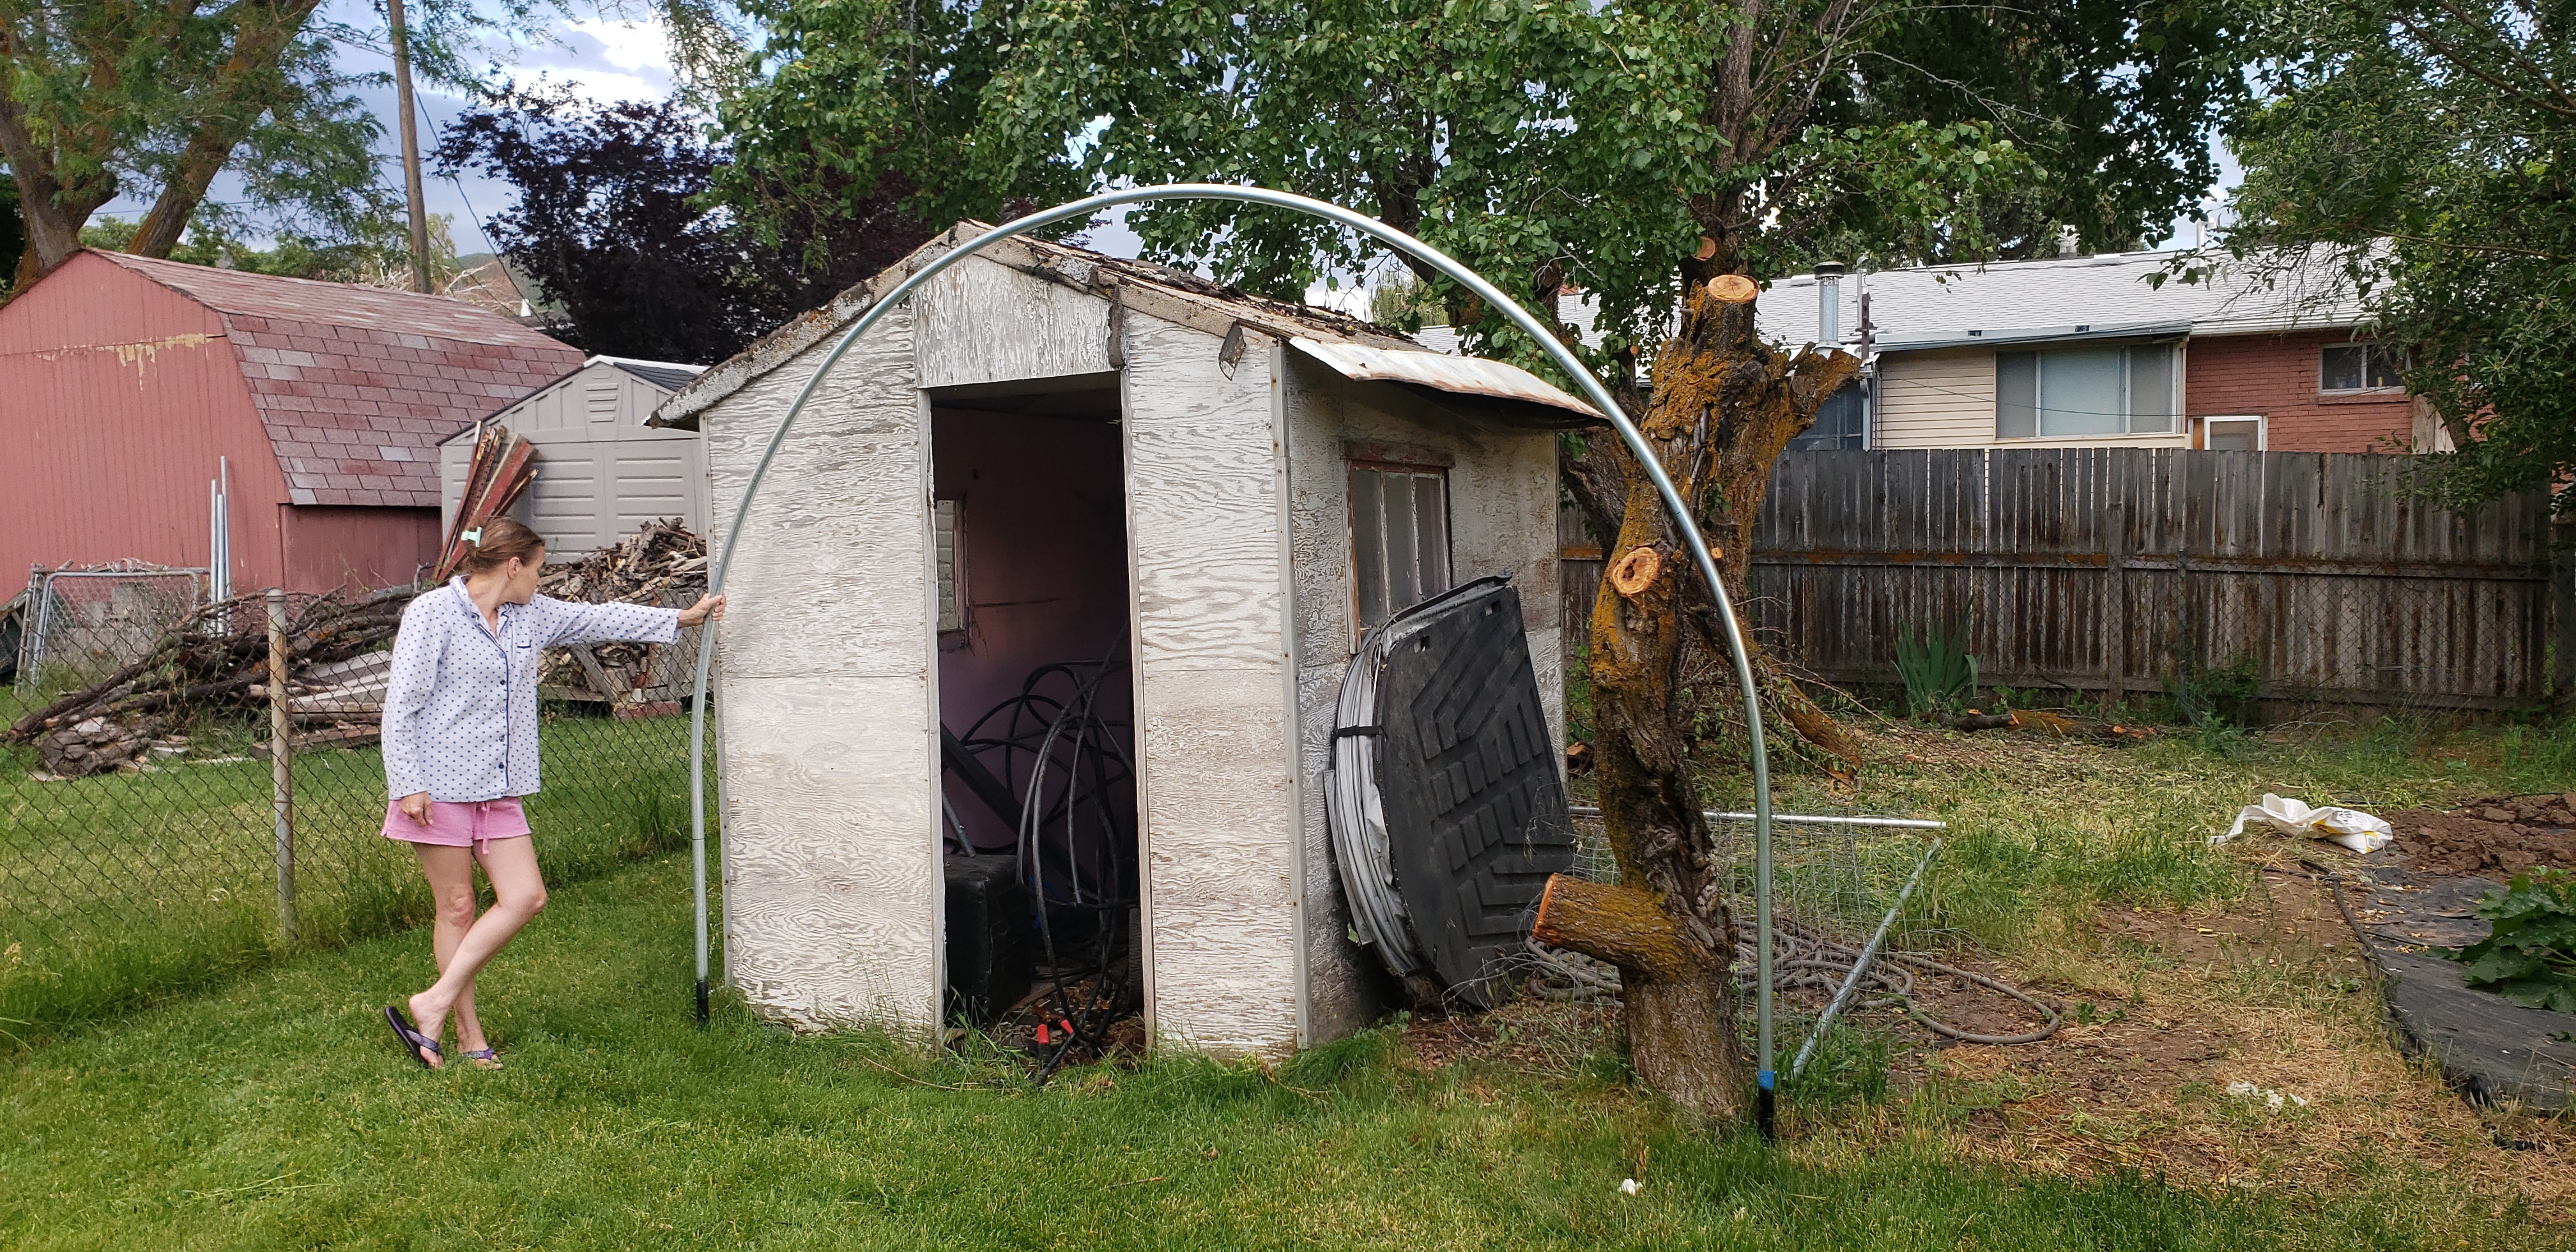 Backyard Greenhouse - Outdoor Growing - Growers Network Forum